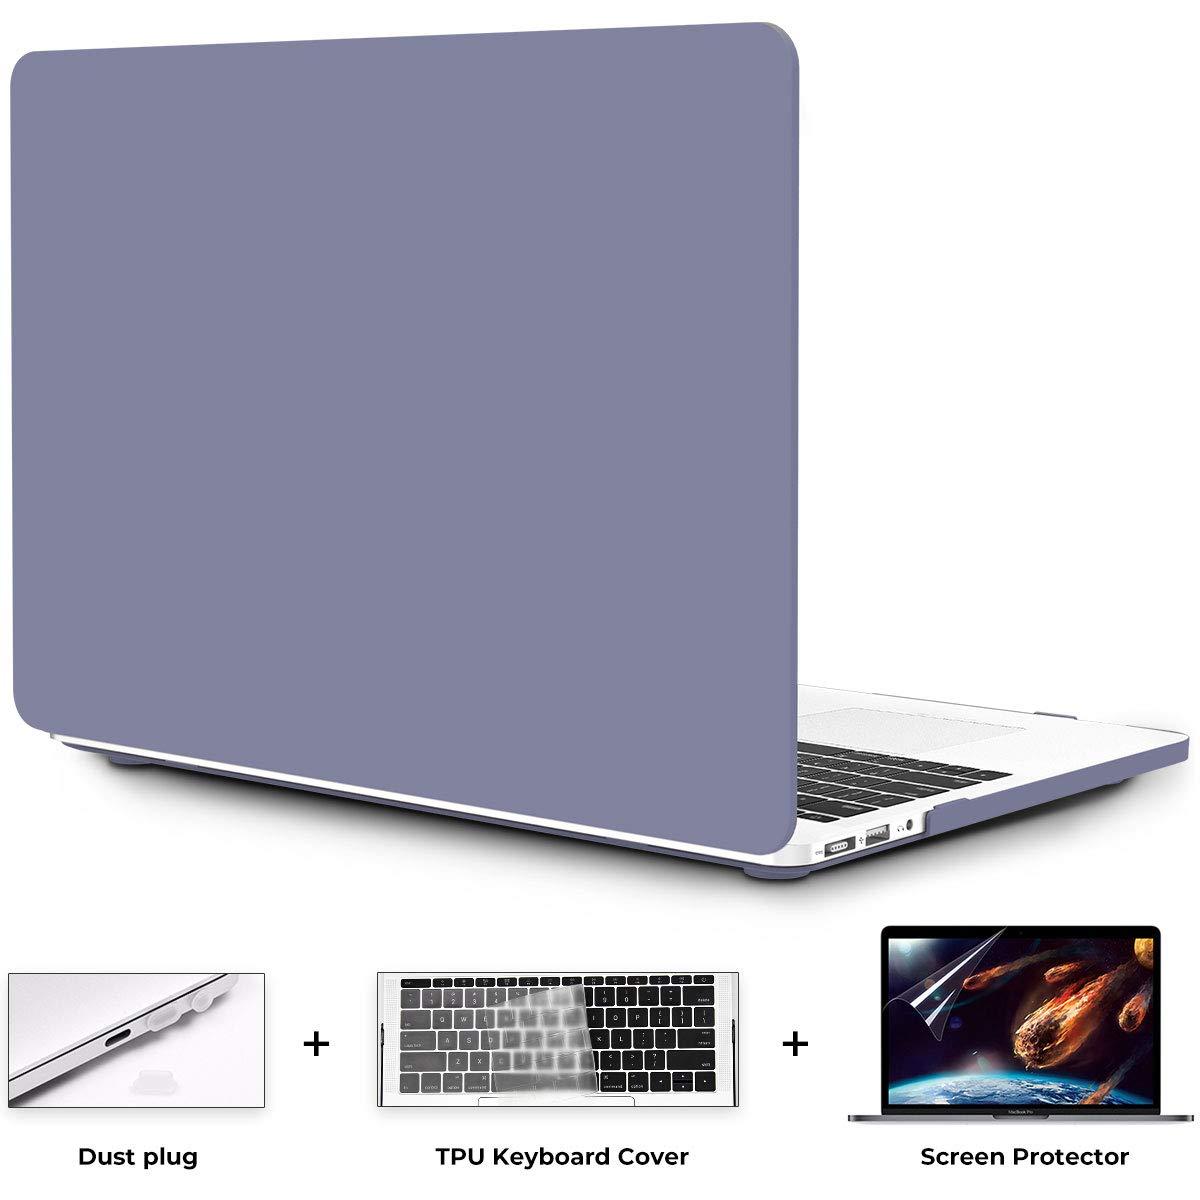 OneGET MacBook Air 13 Inch Case Hard Shell Laptop Case MacBook Air 13 inch Release 2010-2017 A1369 A1466 with Retina Display Computer Case MacBook Air 13 Inch Cream Color Series MacBook Lavender Grey